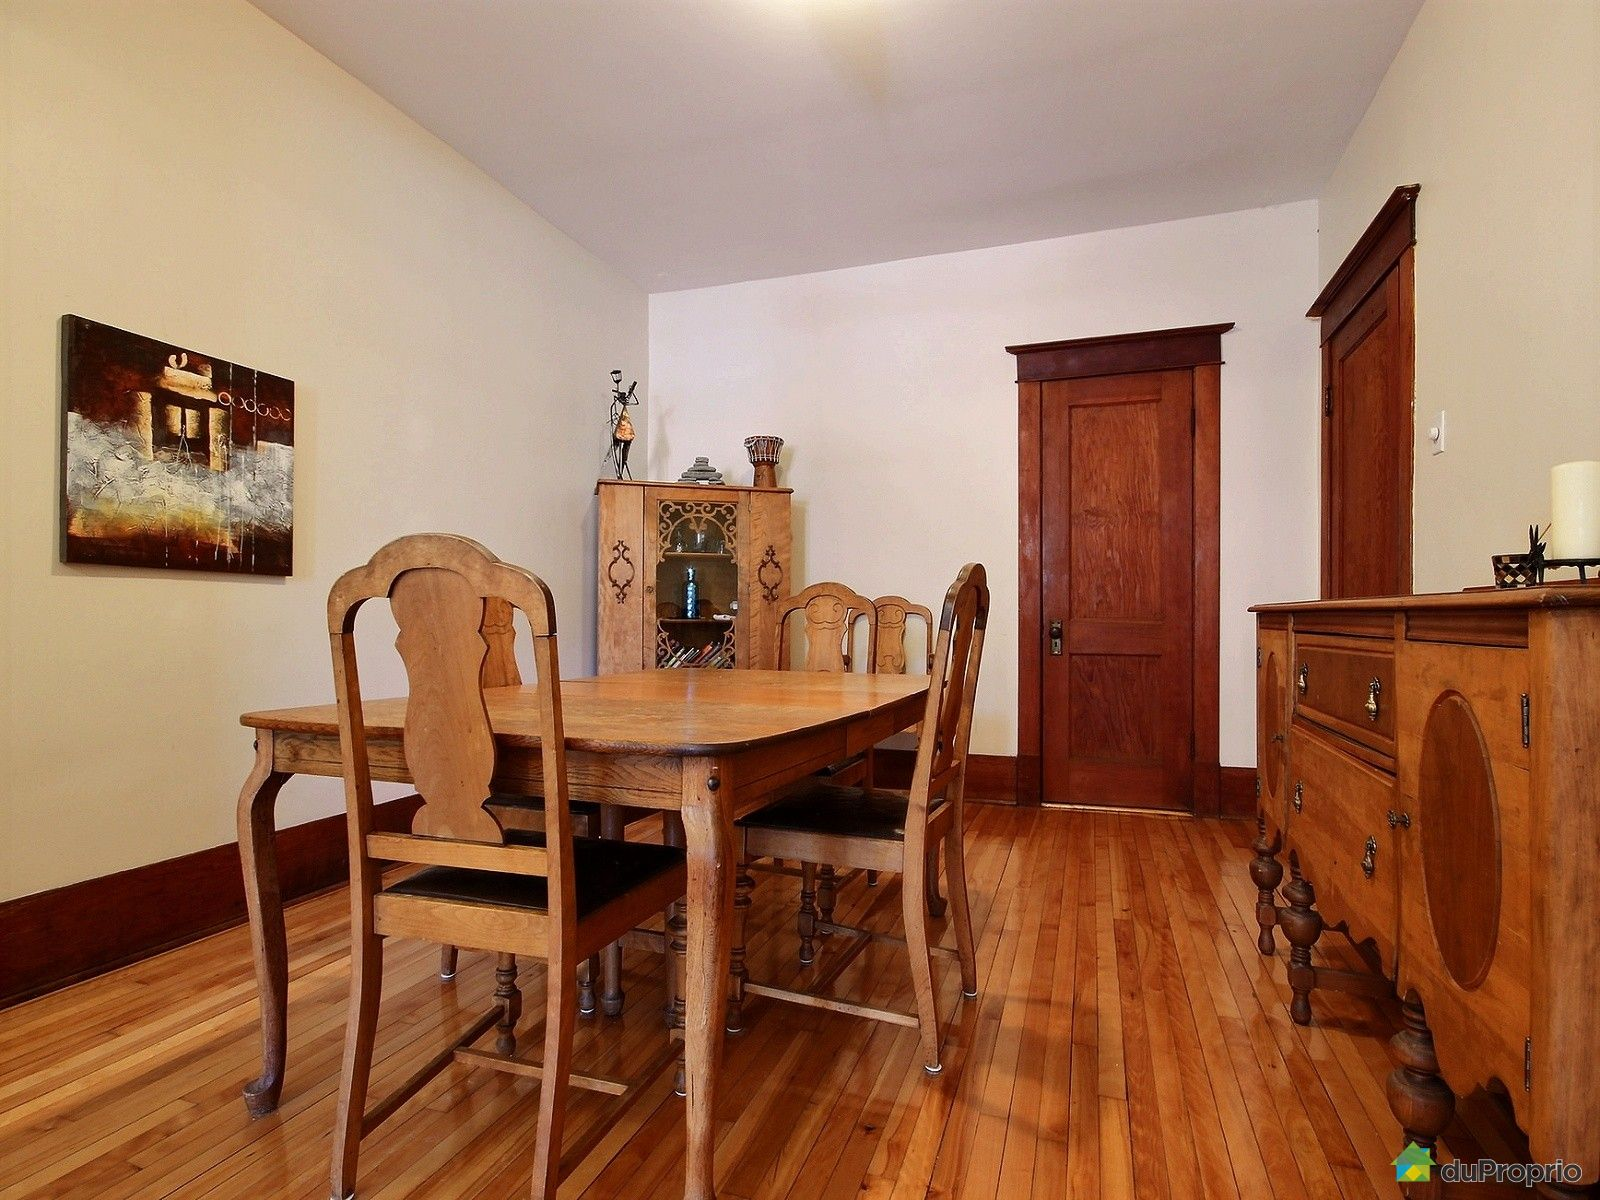 quintuplex vendre montr al 1460 rue de ville marie. Black Bedroom Furniture Sets. Home Design Ideas